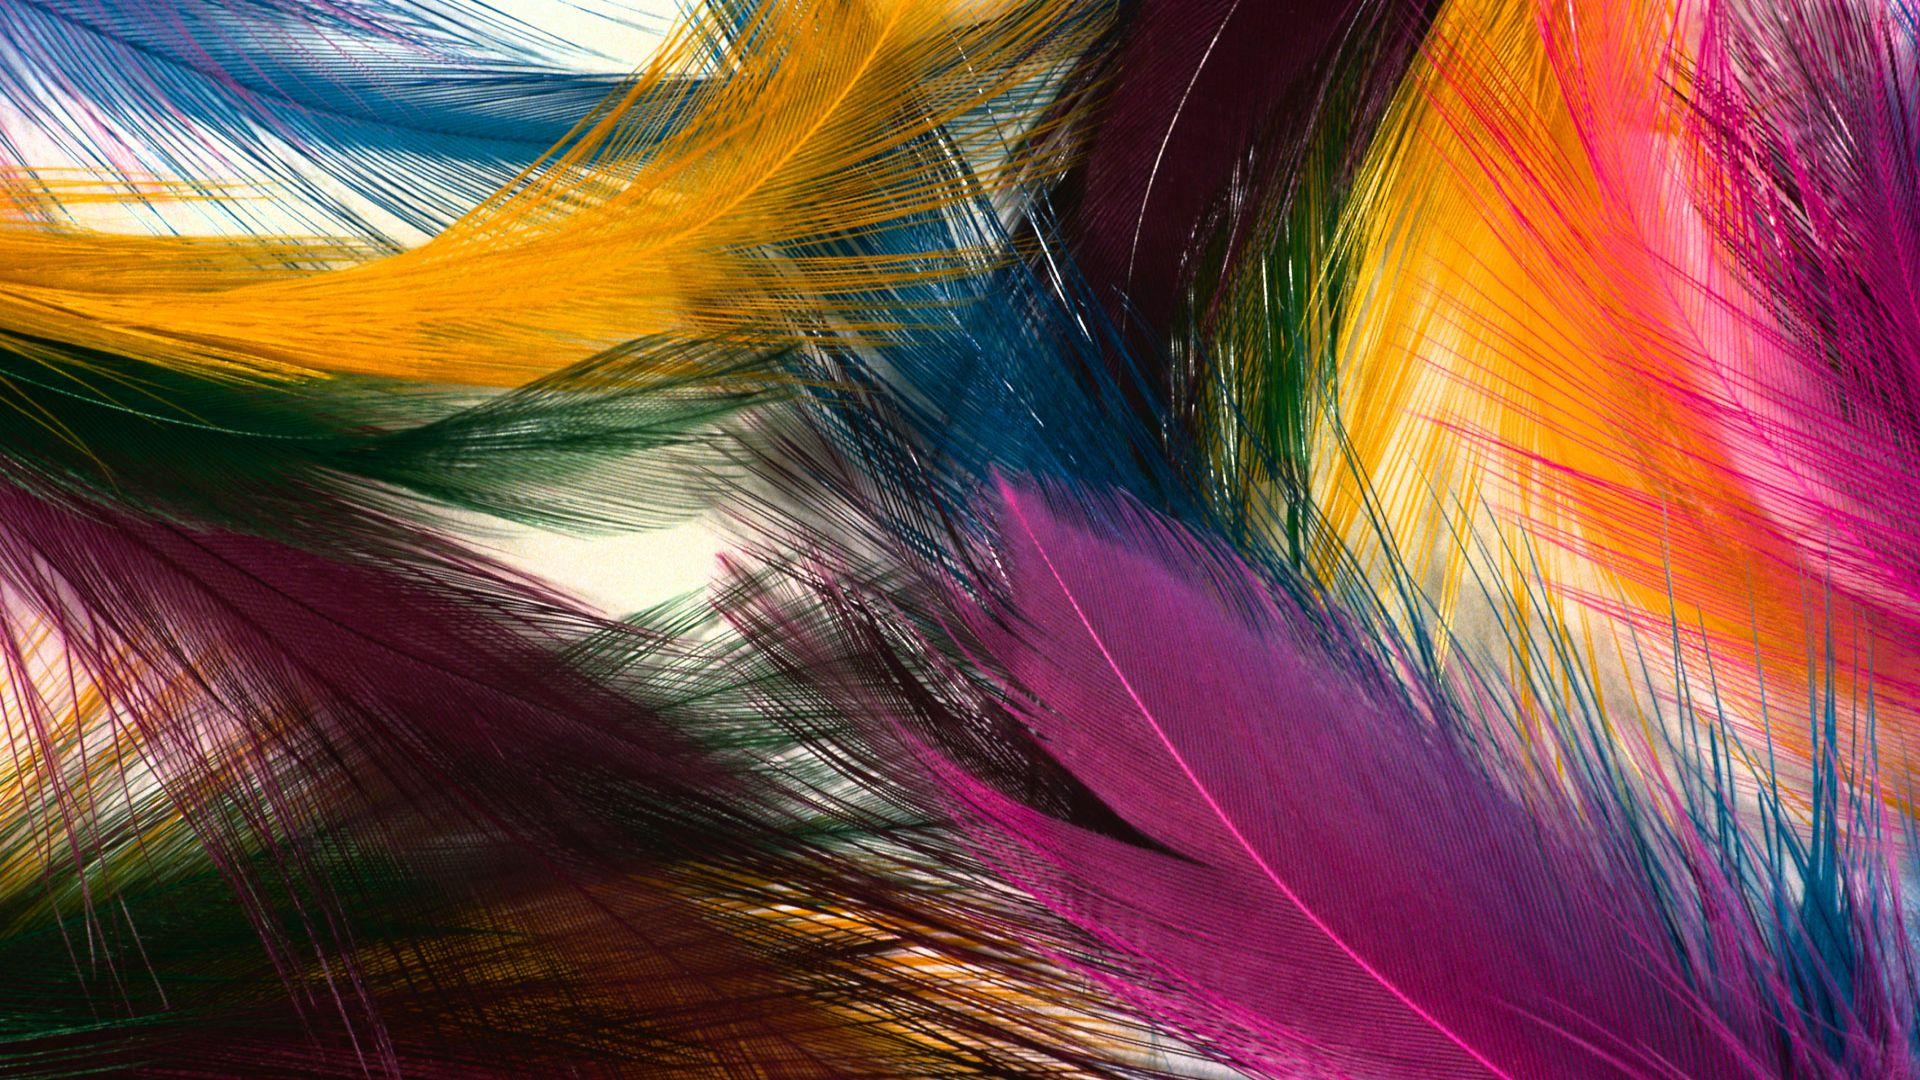 Solid Color Hd Wallpapers Pixelstalk Color Motion Iphone S